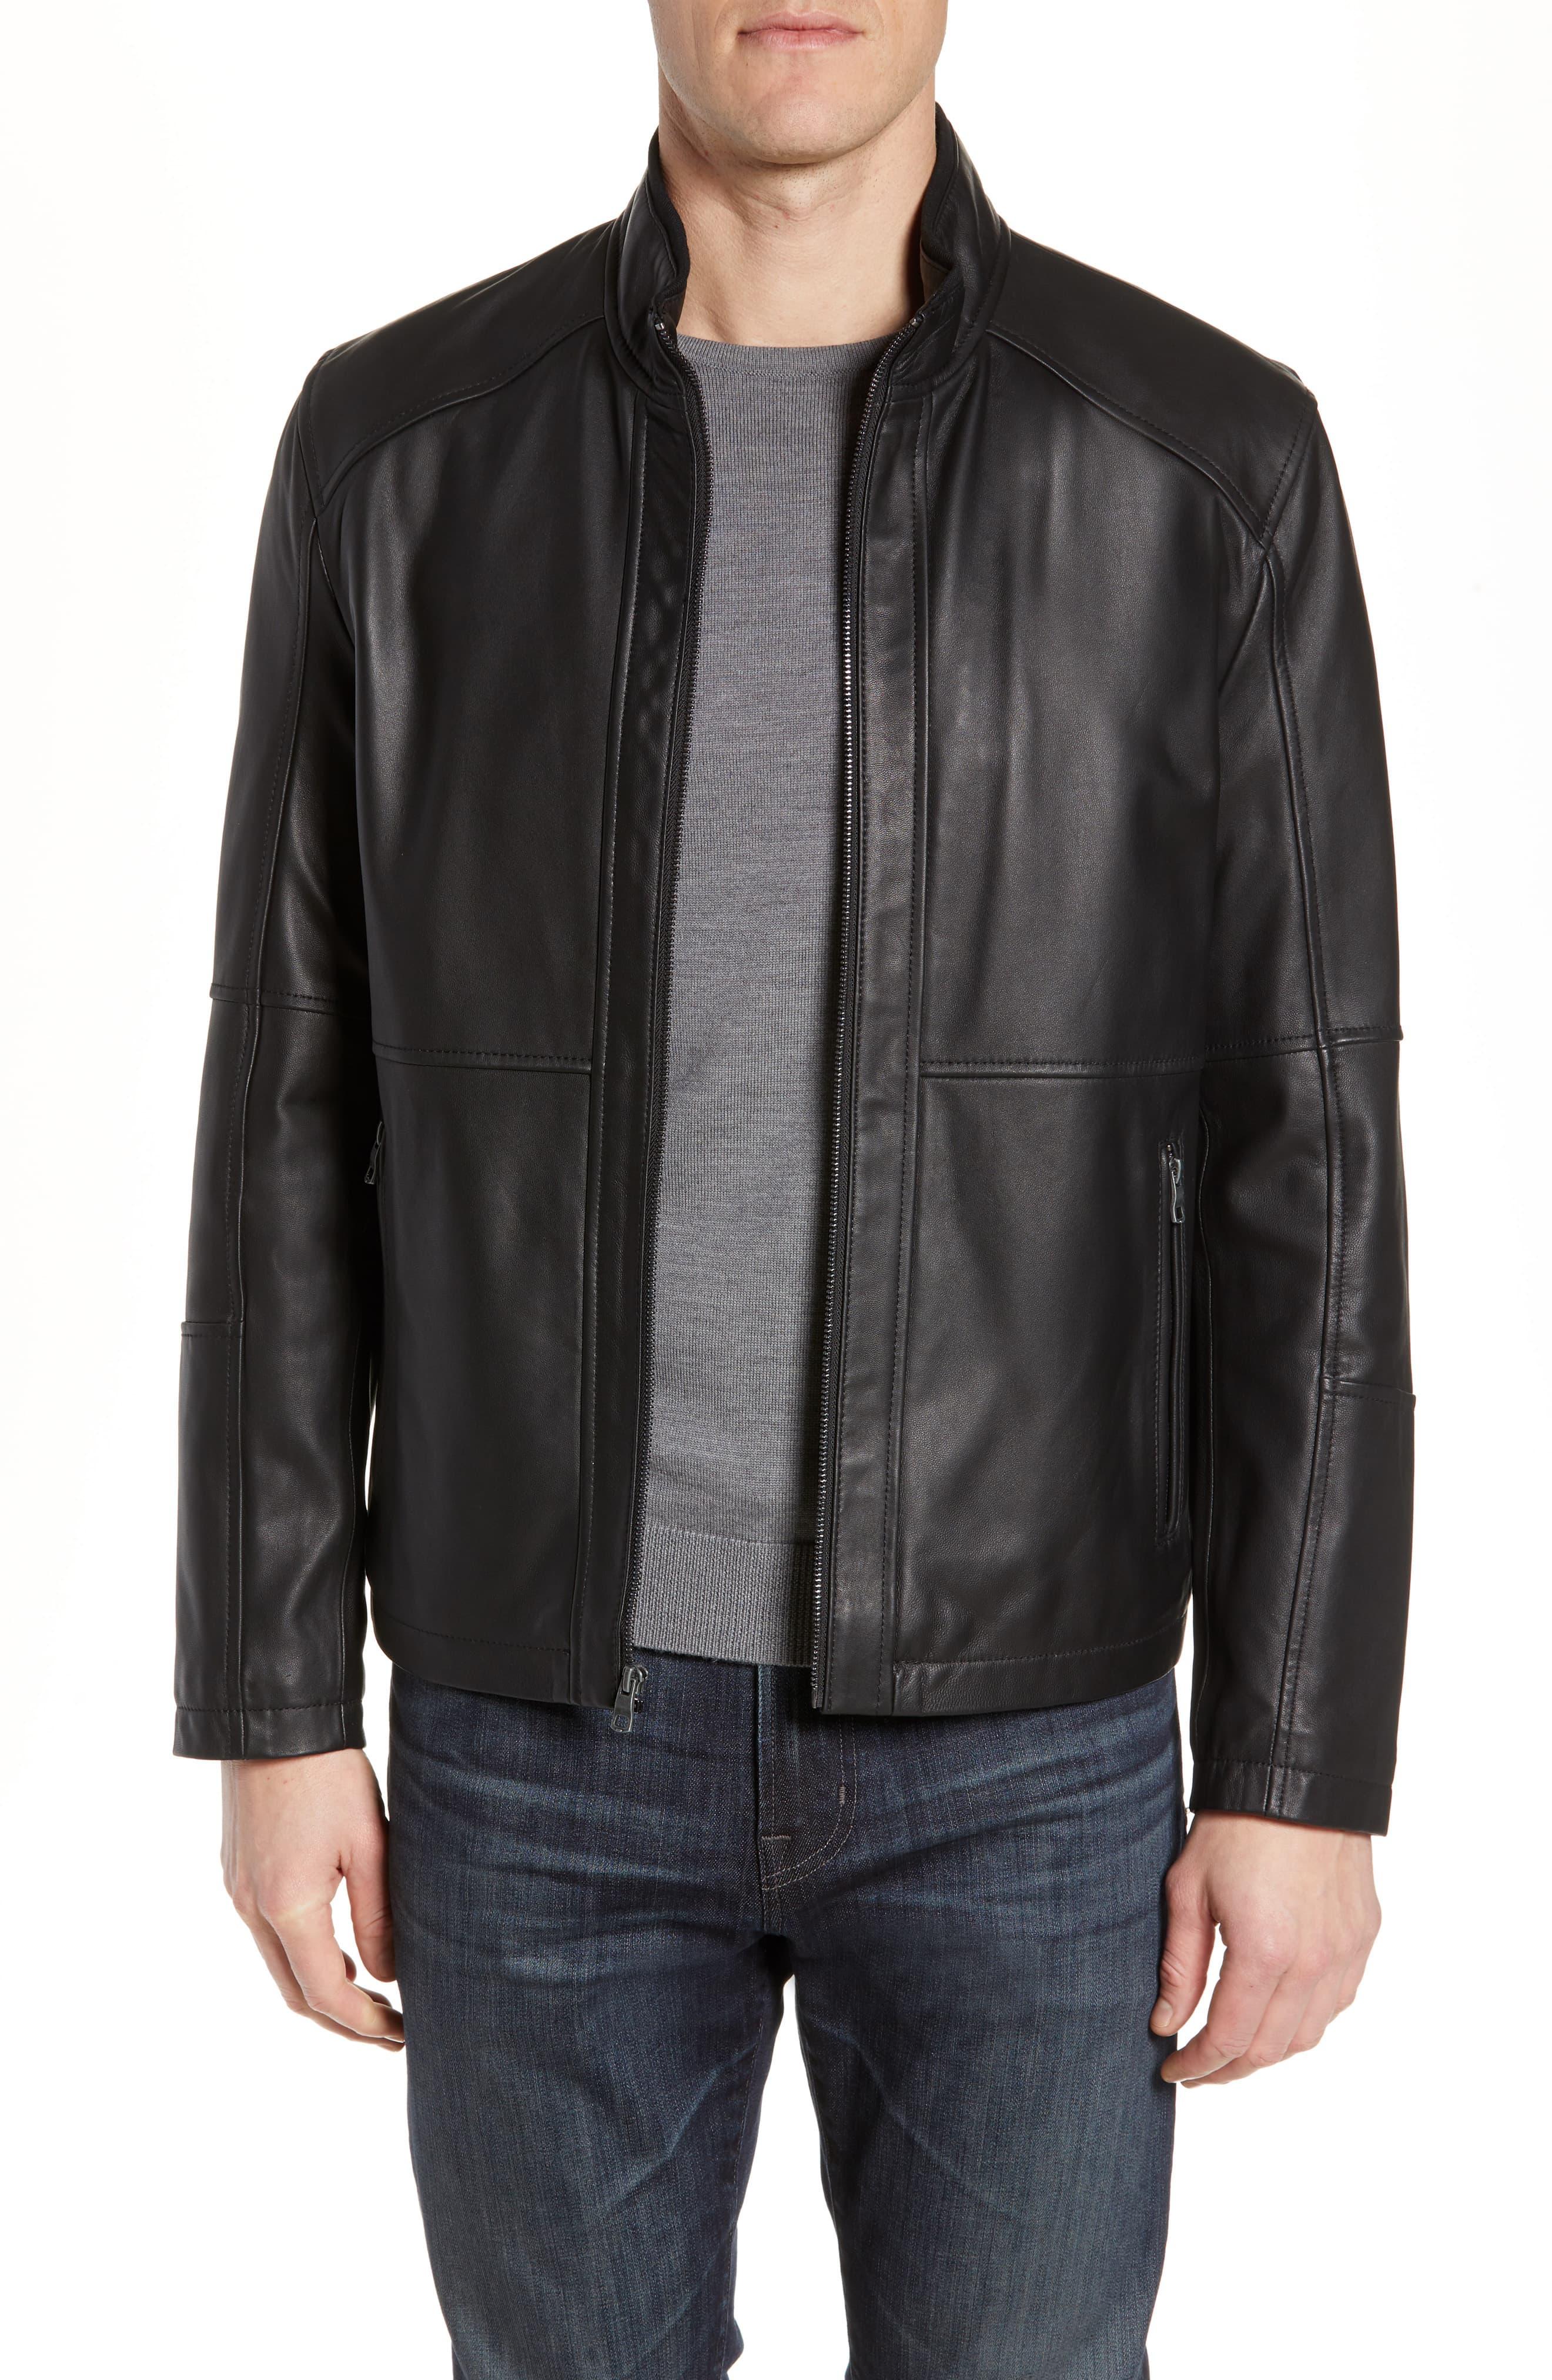 Men's Andrew Marc Wiley Lambskin Leather Jacket, Size